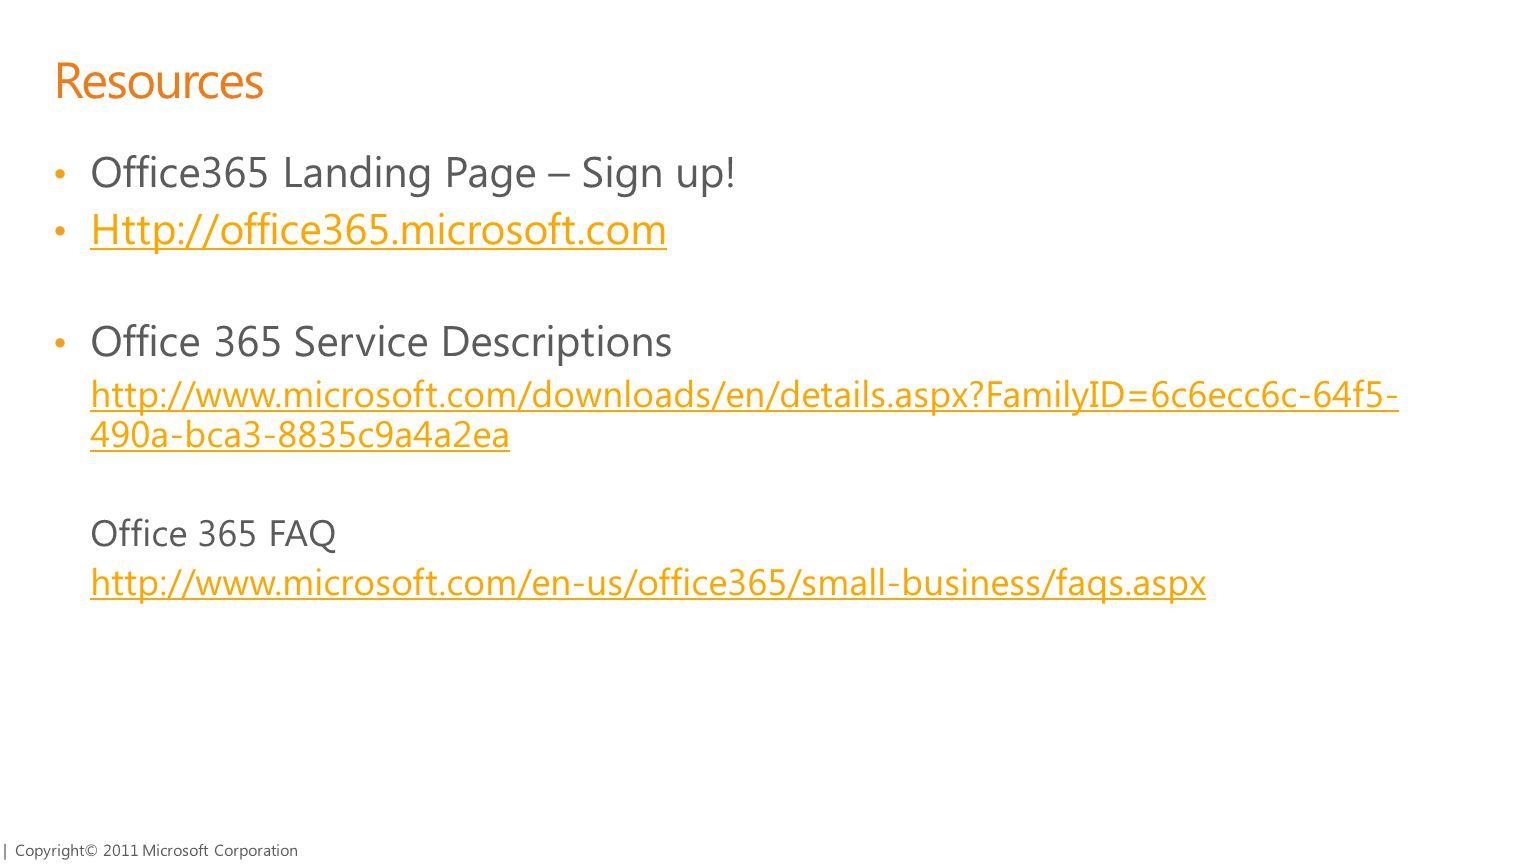 Resources Office365 Landing Page – Sign up! Http://office365.microsoft.com Office 365 Service Descriptions http://www.microsoft.com/downloads/en/detai